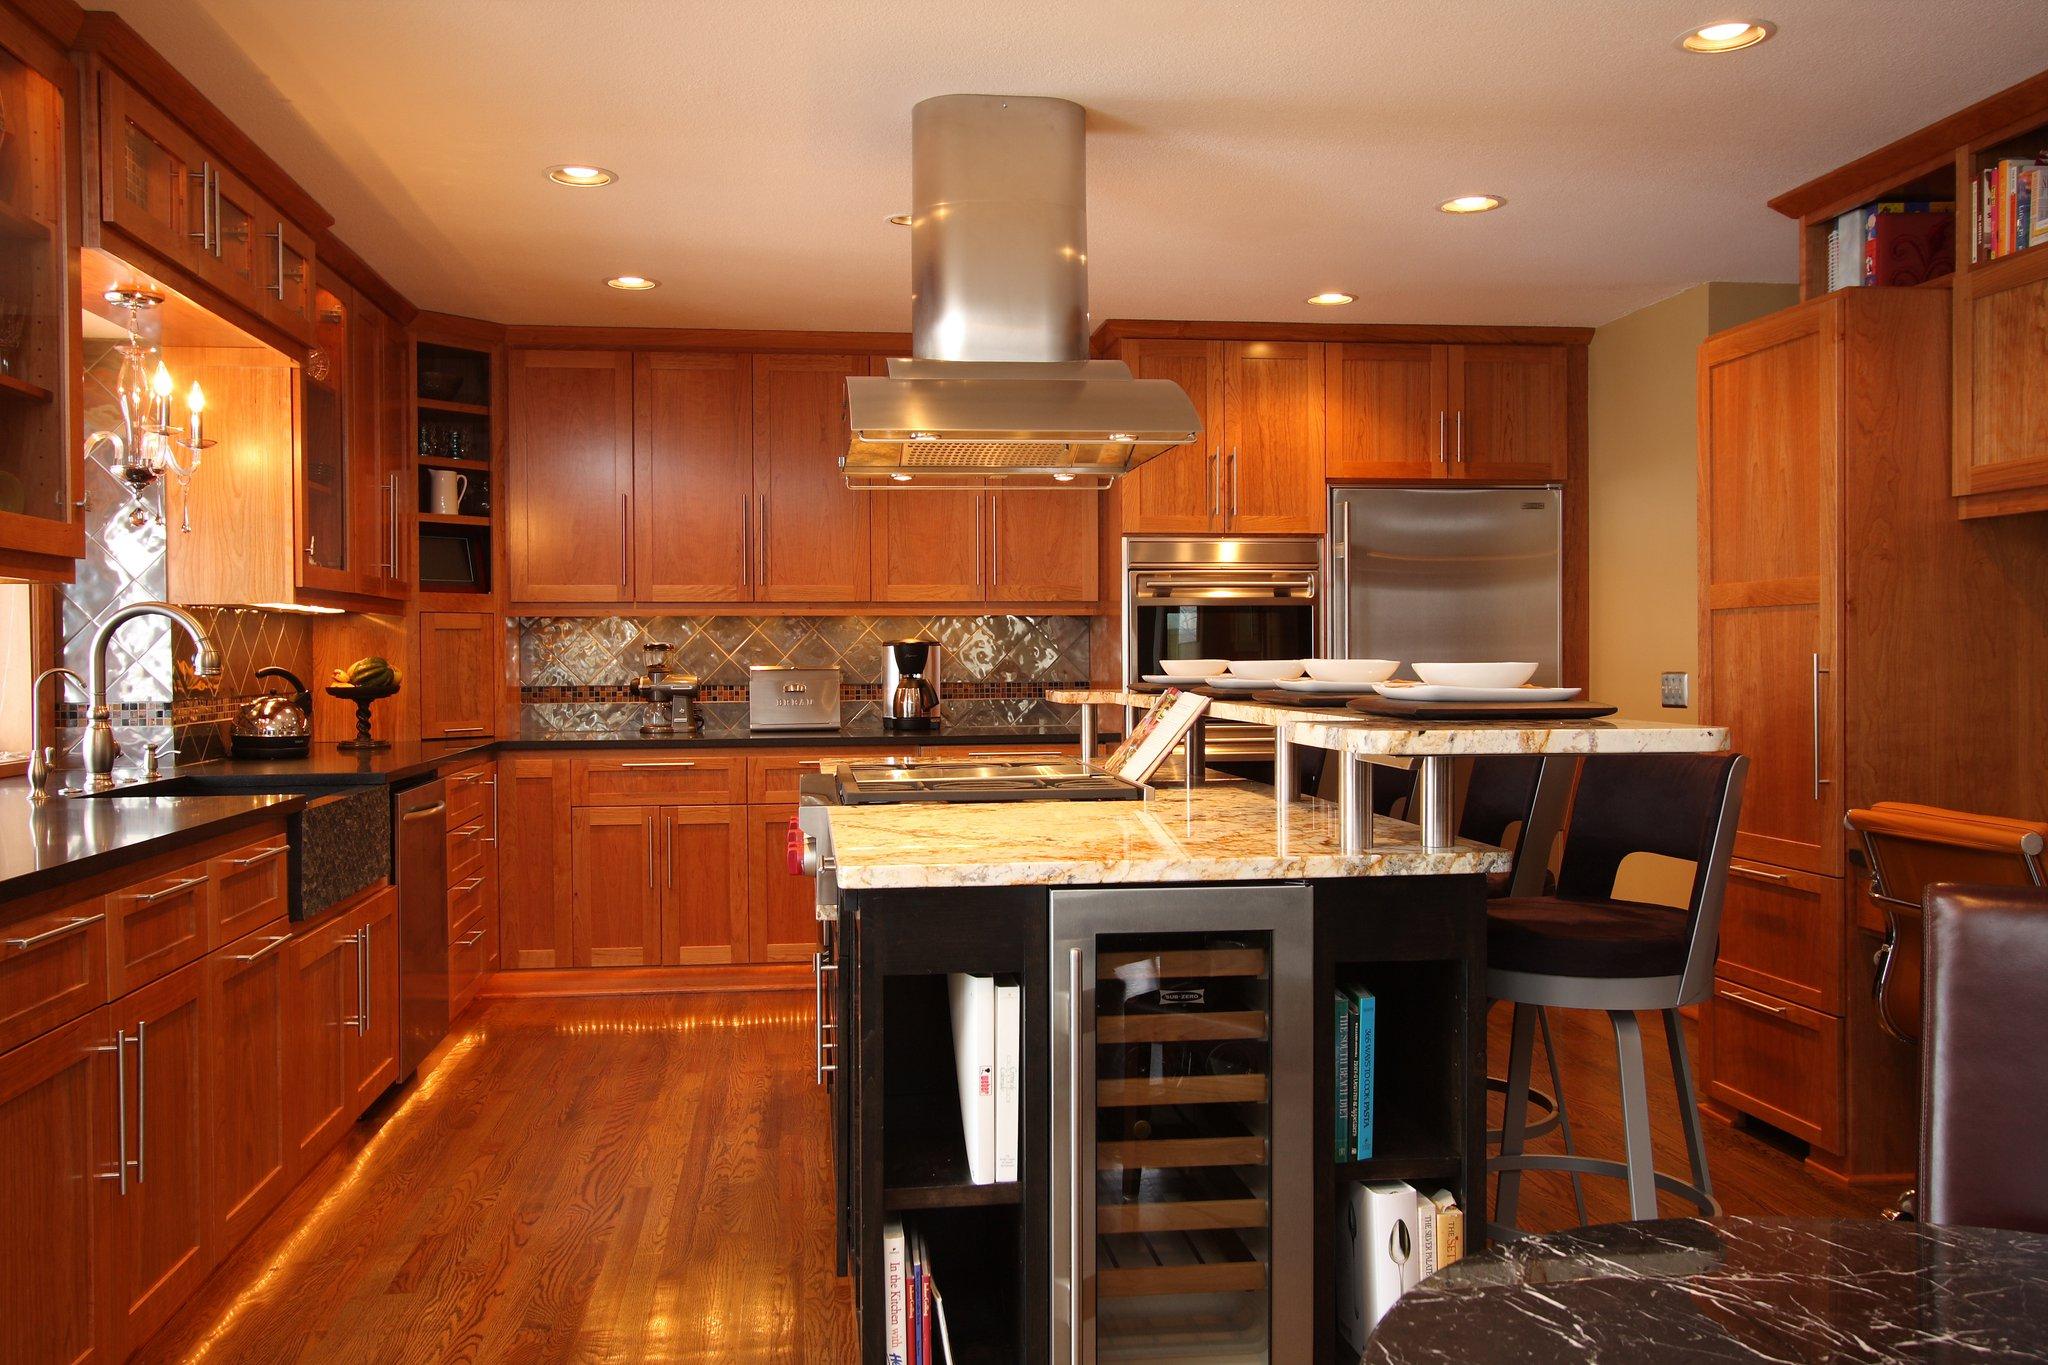 custom-kitchen-cabinets-designs